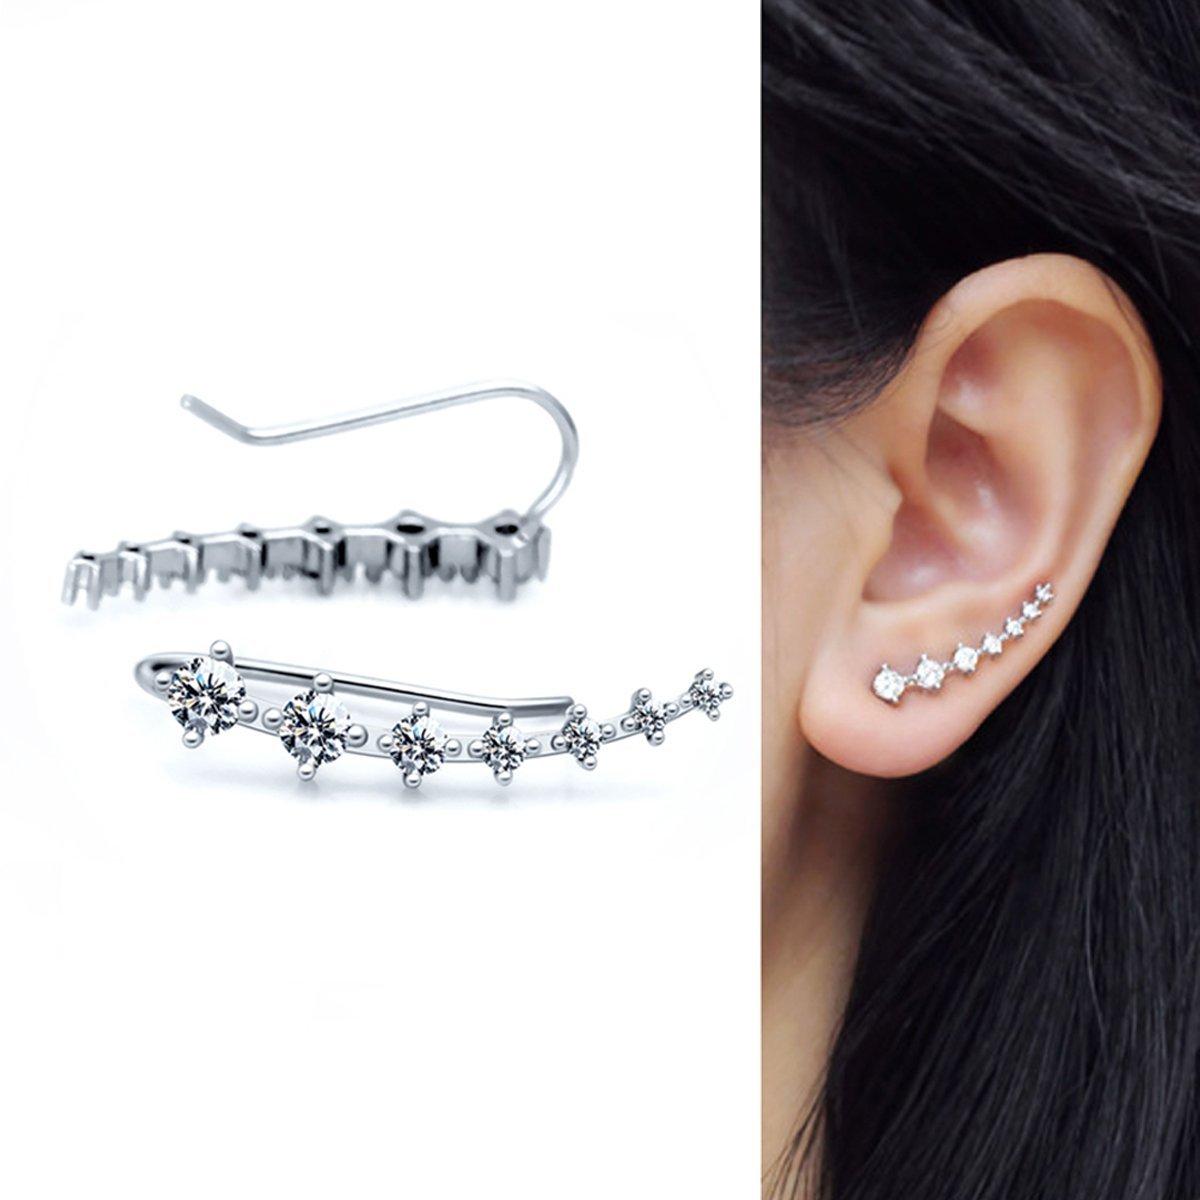 1 Pair 925 Sterling Silver Flowers Cubic Zirconia Ear Cuff Wrap Earring SmallDragon xl-5566-3